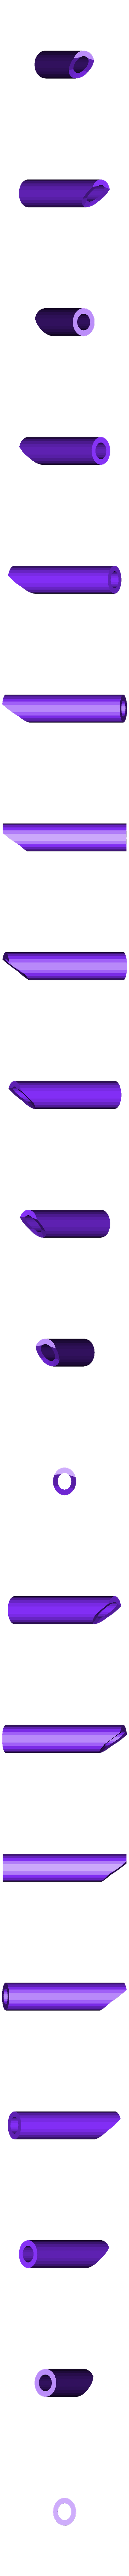 Blower_Tube.stl Download free STL file Gaslands Greebles (Blowers and Burners) • Design to 3D print, Ellie_Valkyrie